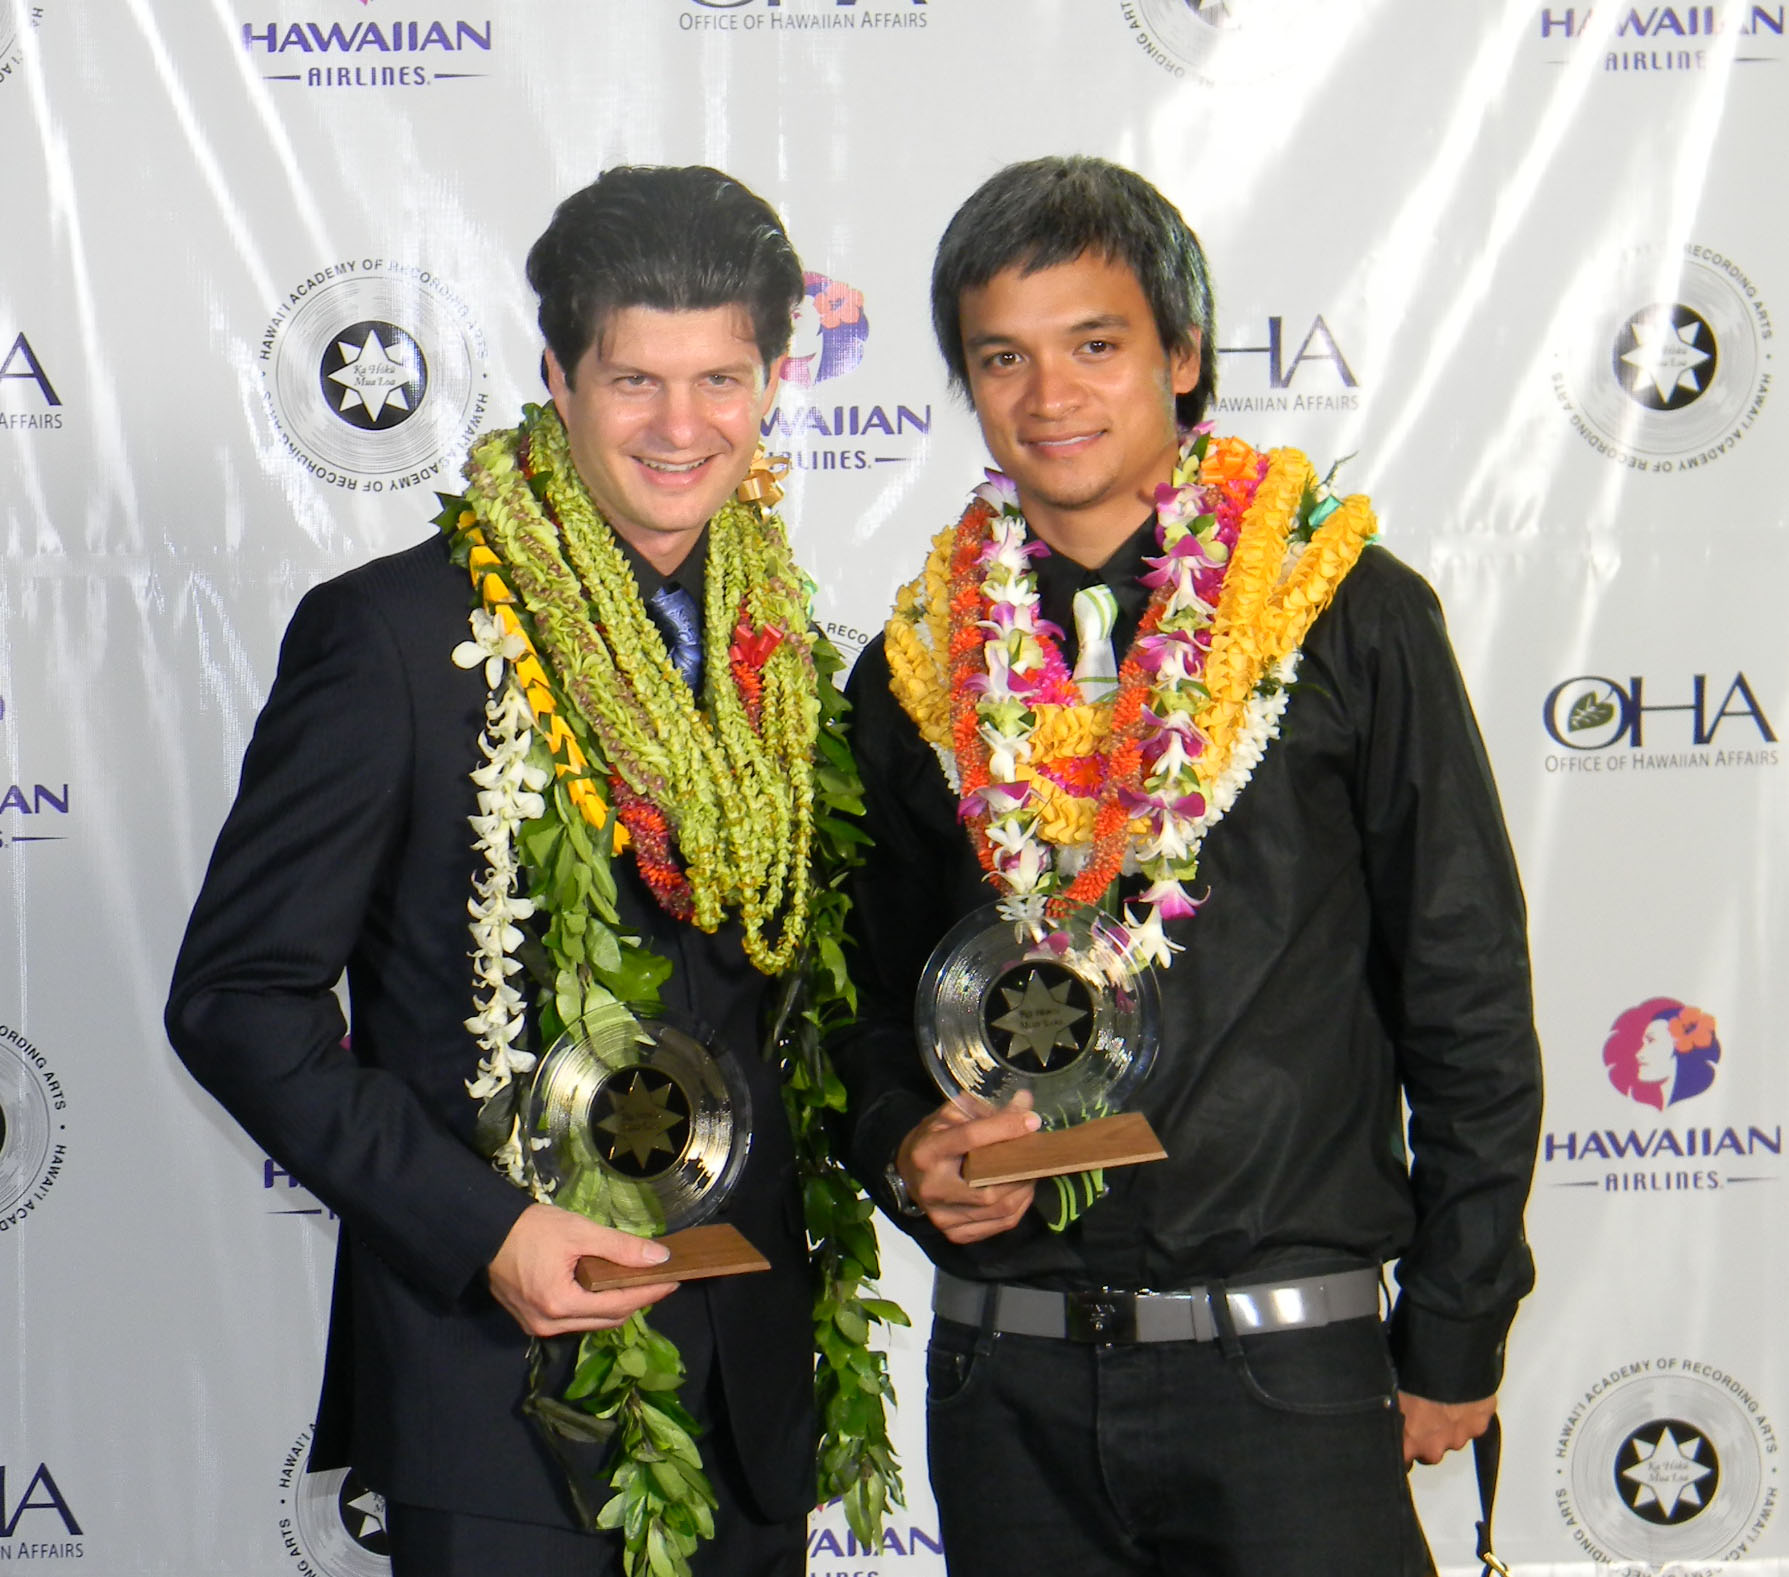 Grammy Award Hawaii News And Island Information